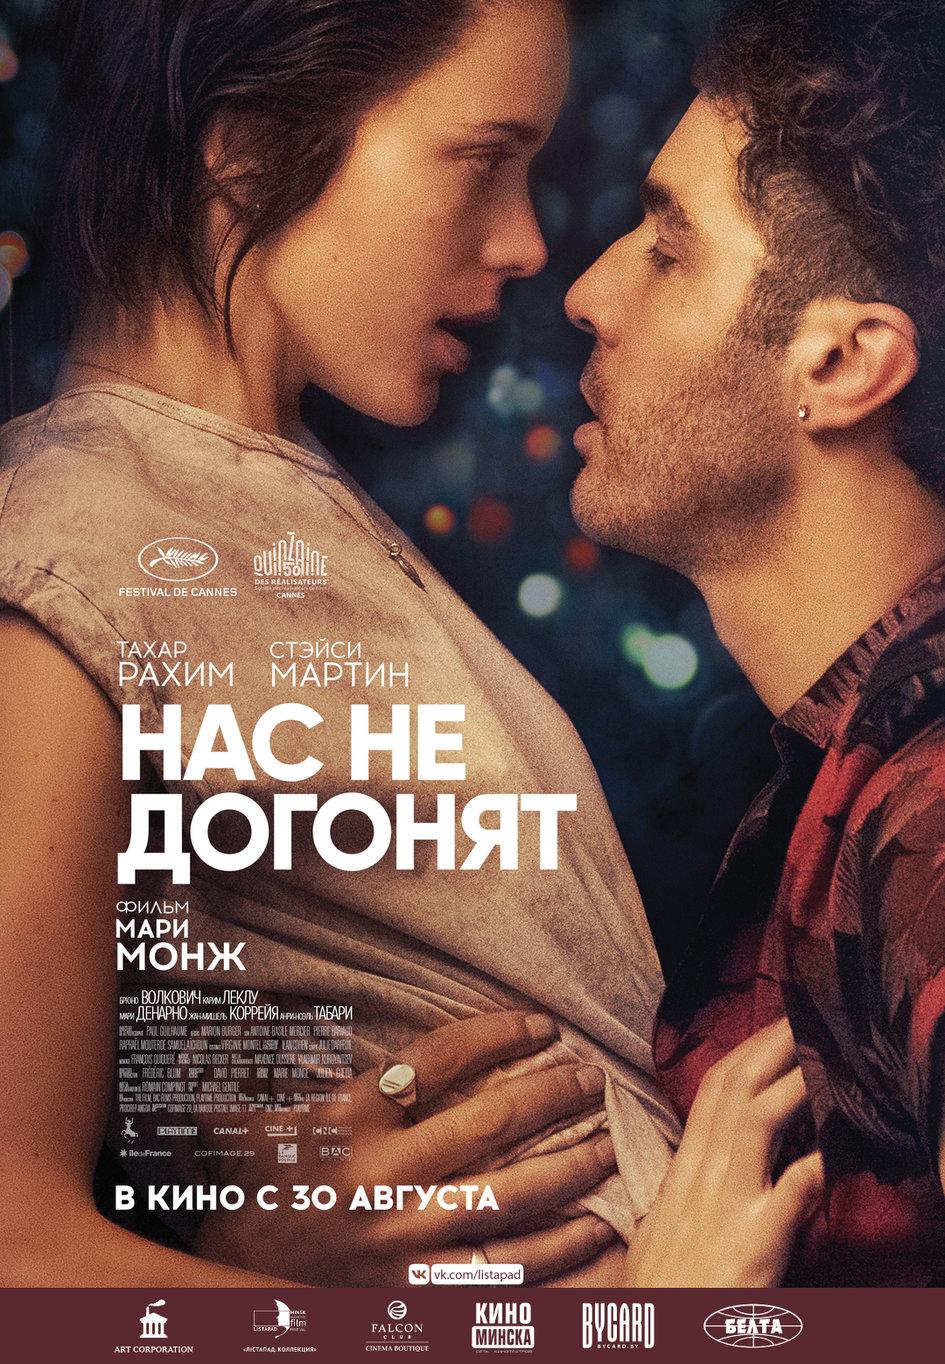 Film rencontre amoureuse